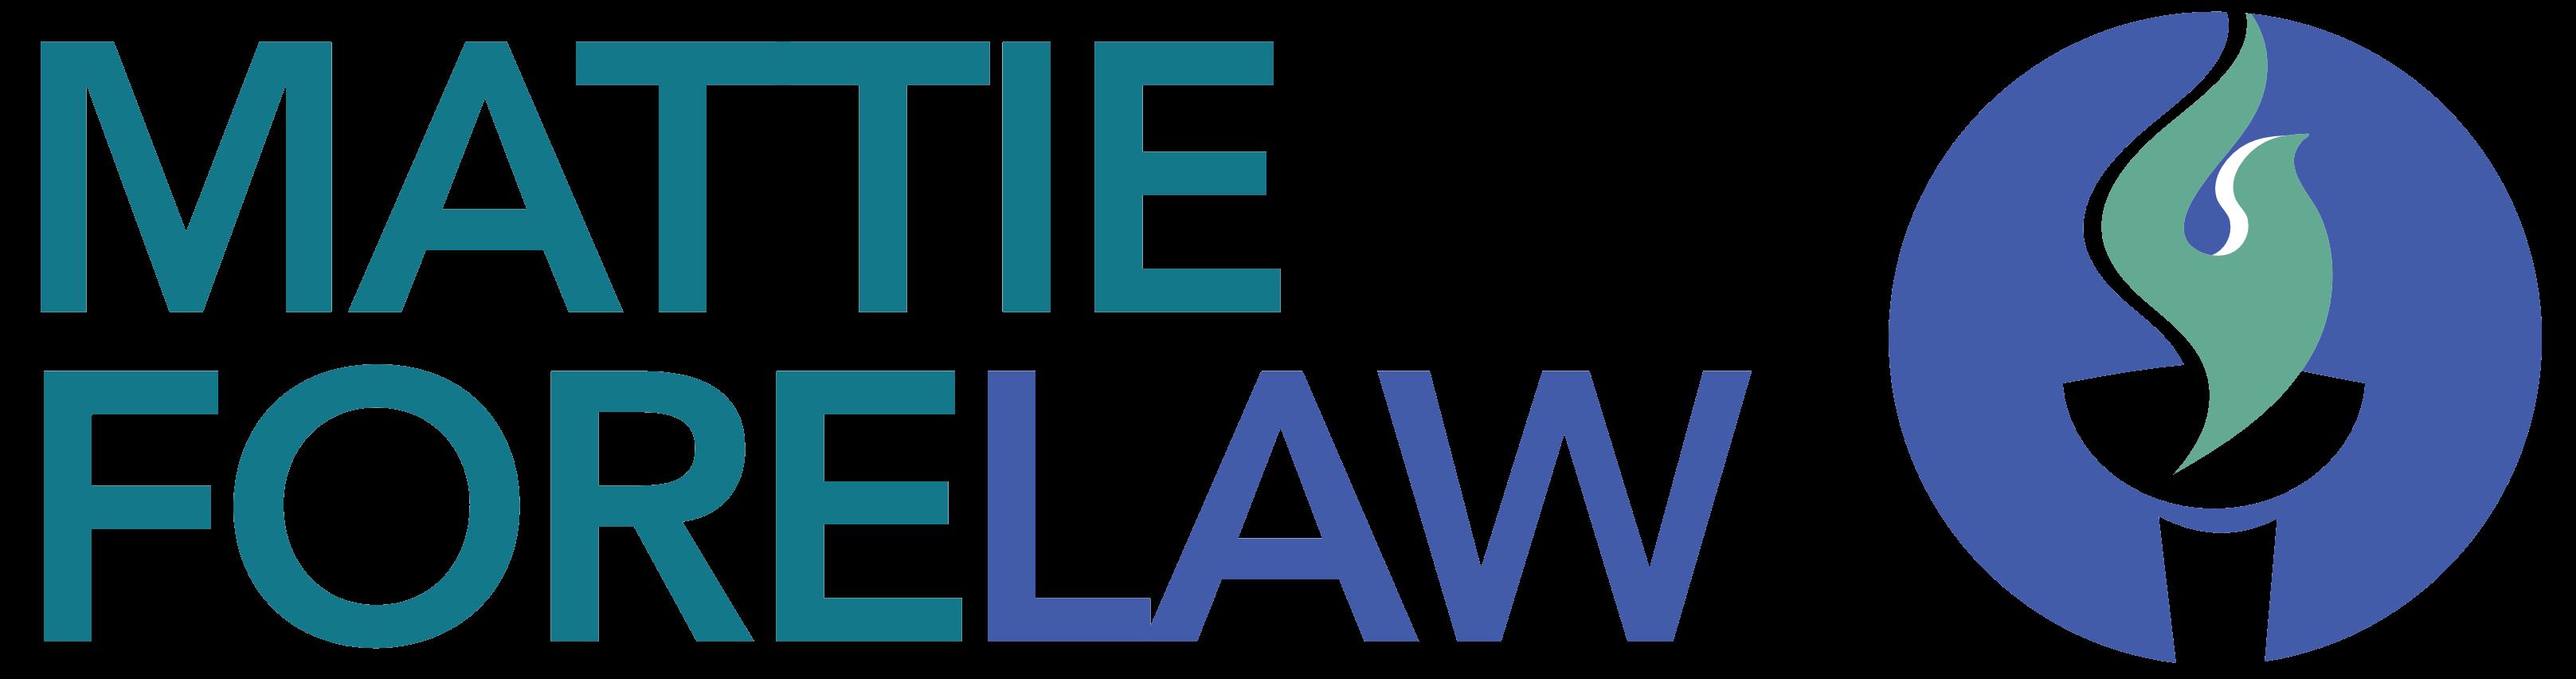 Mattie Fore Law LLC